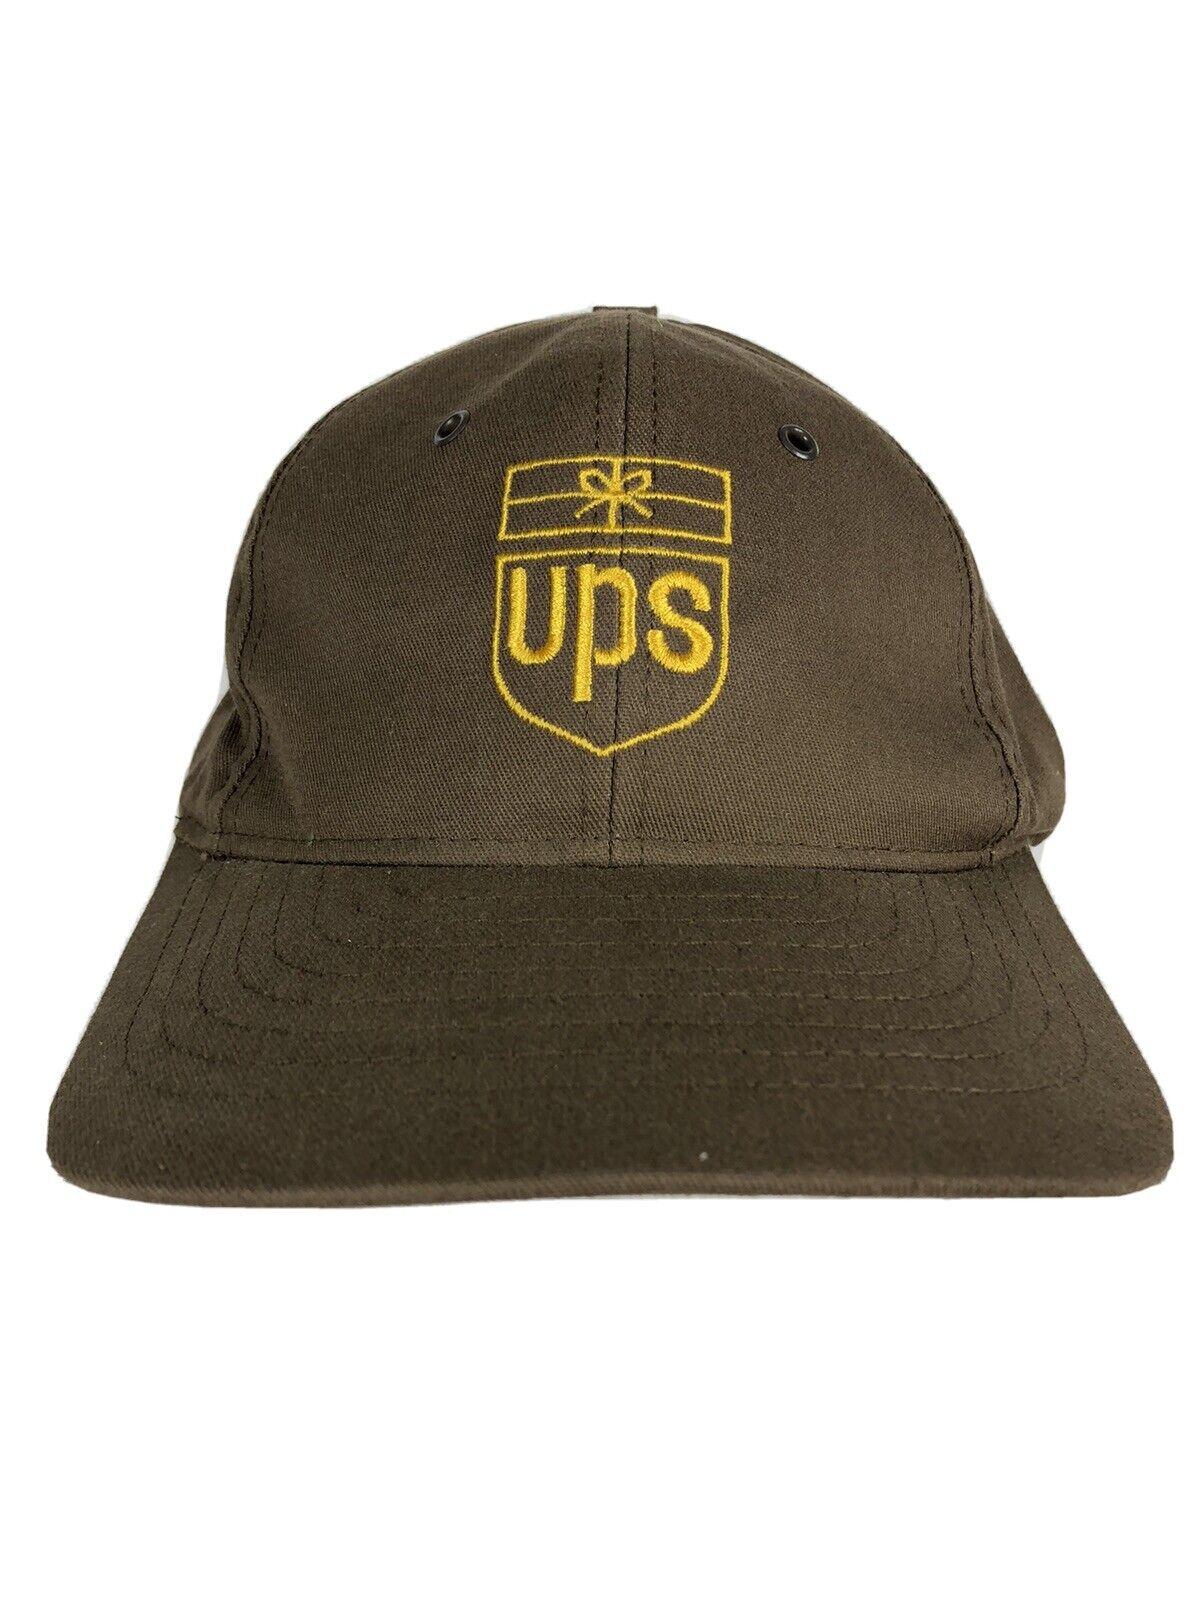 Vintage UPS Trucker Hat Delivery Driver 90s Brown Gift Box Design Snapback H7